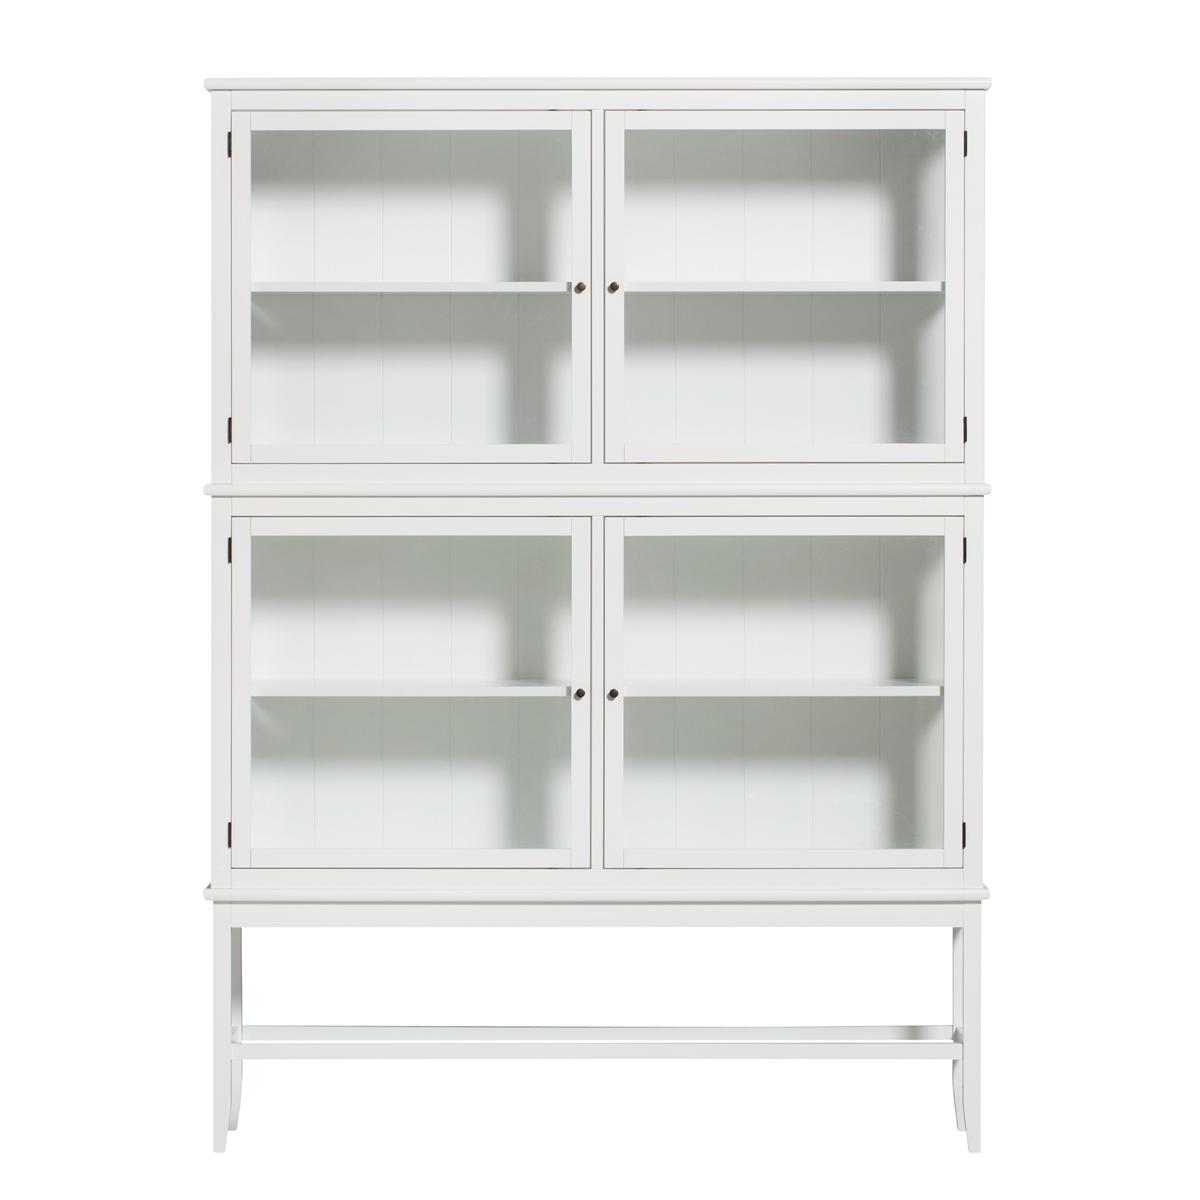 Vitrinskåp Seaside med ben vit, Oliver Furniture